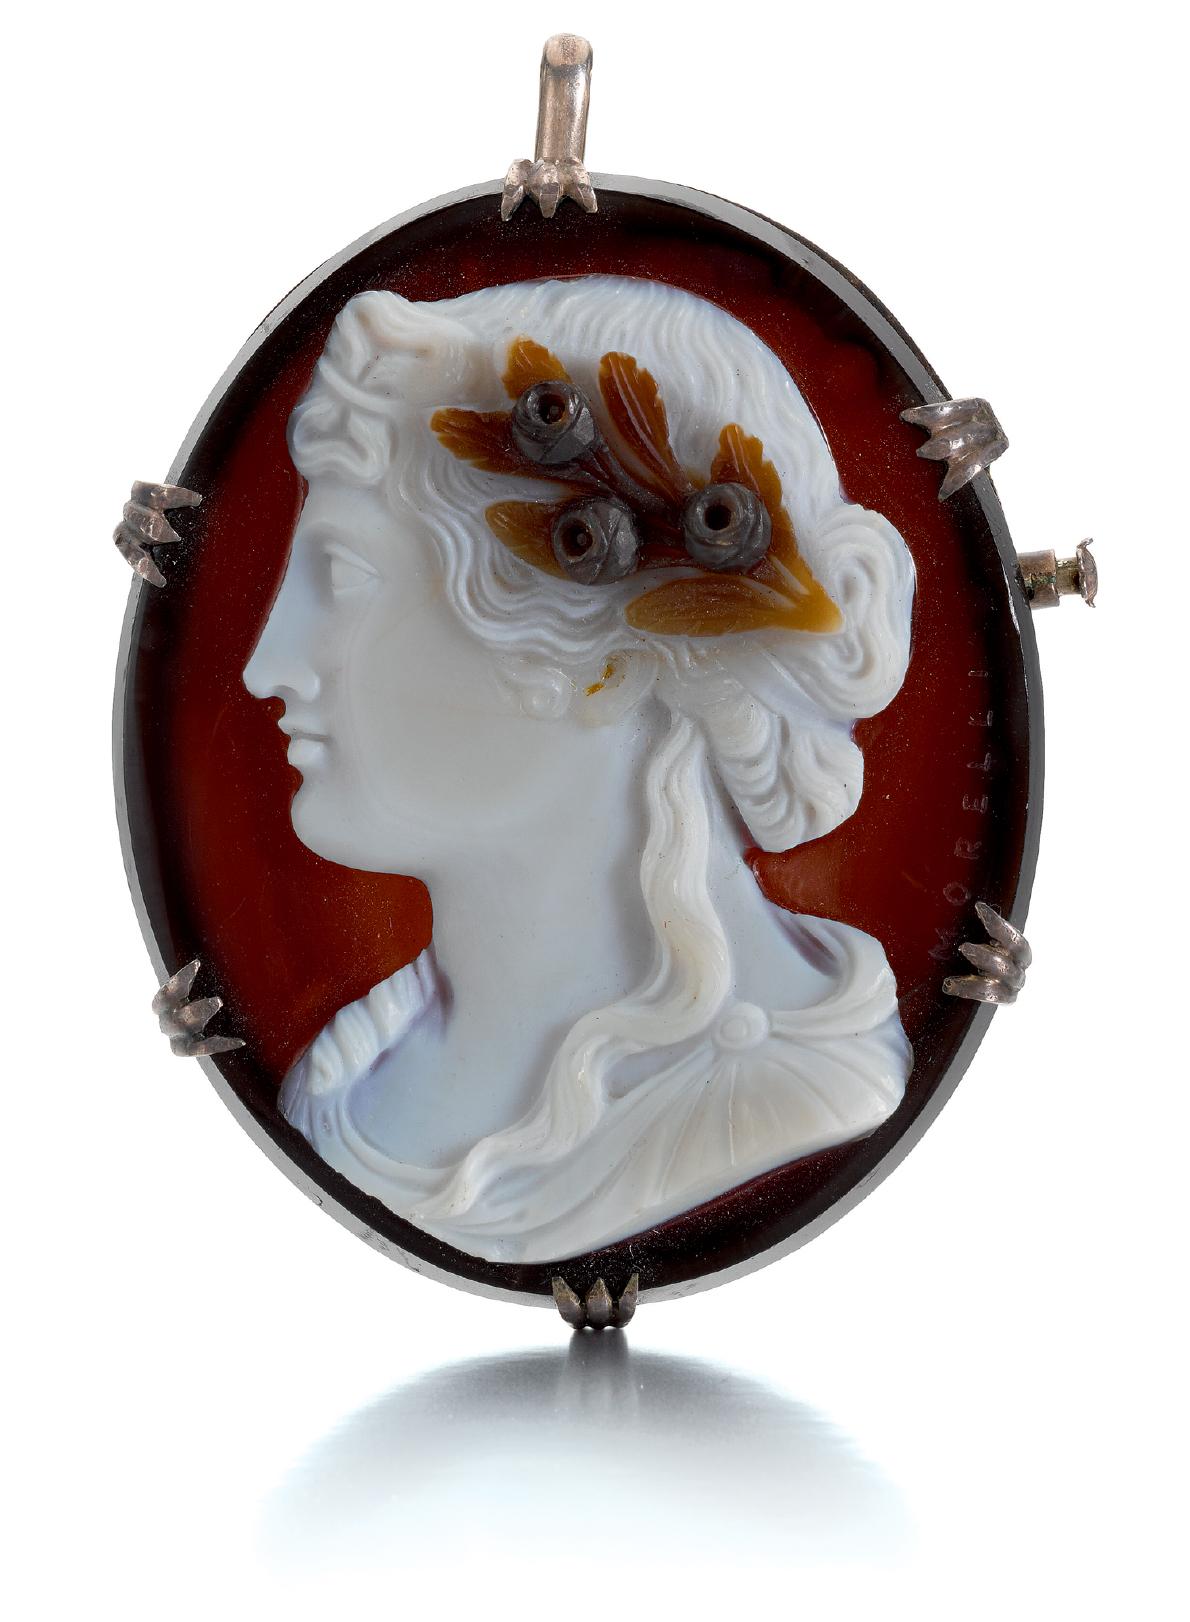 NICOLO MORELLI (1771-1838), ITALIAN, 19TH CENTURY   CAMEO WITH THE PROFILE OF A WOMAN